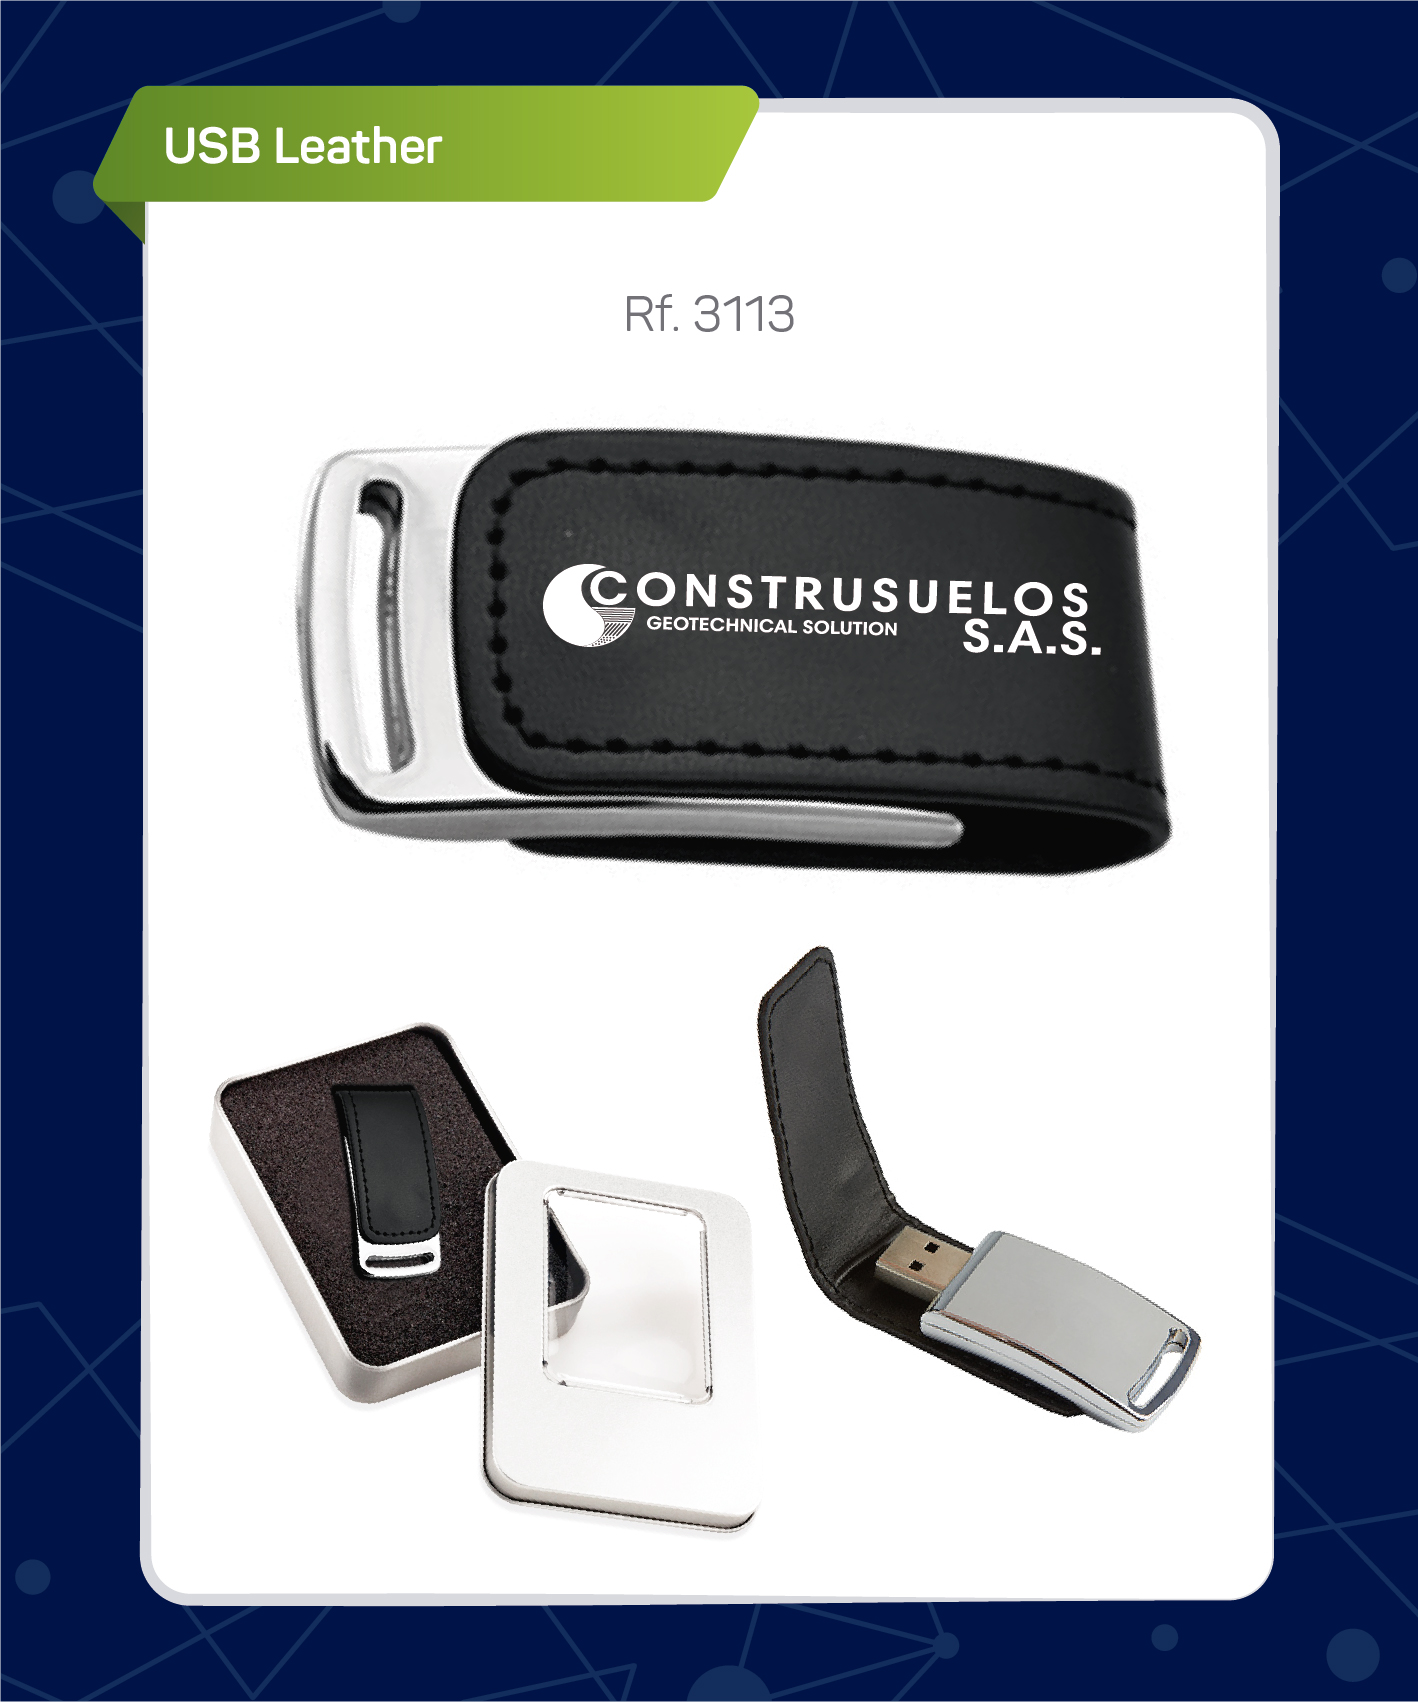 USB LEATHER